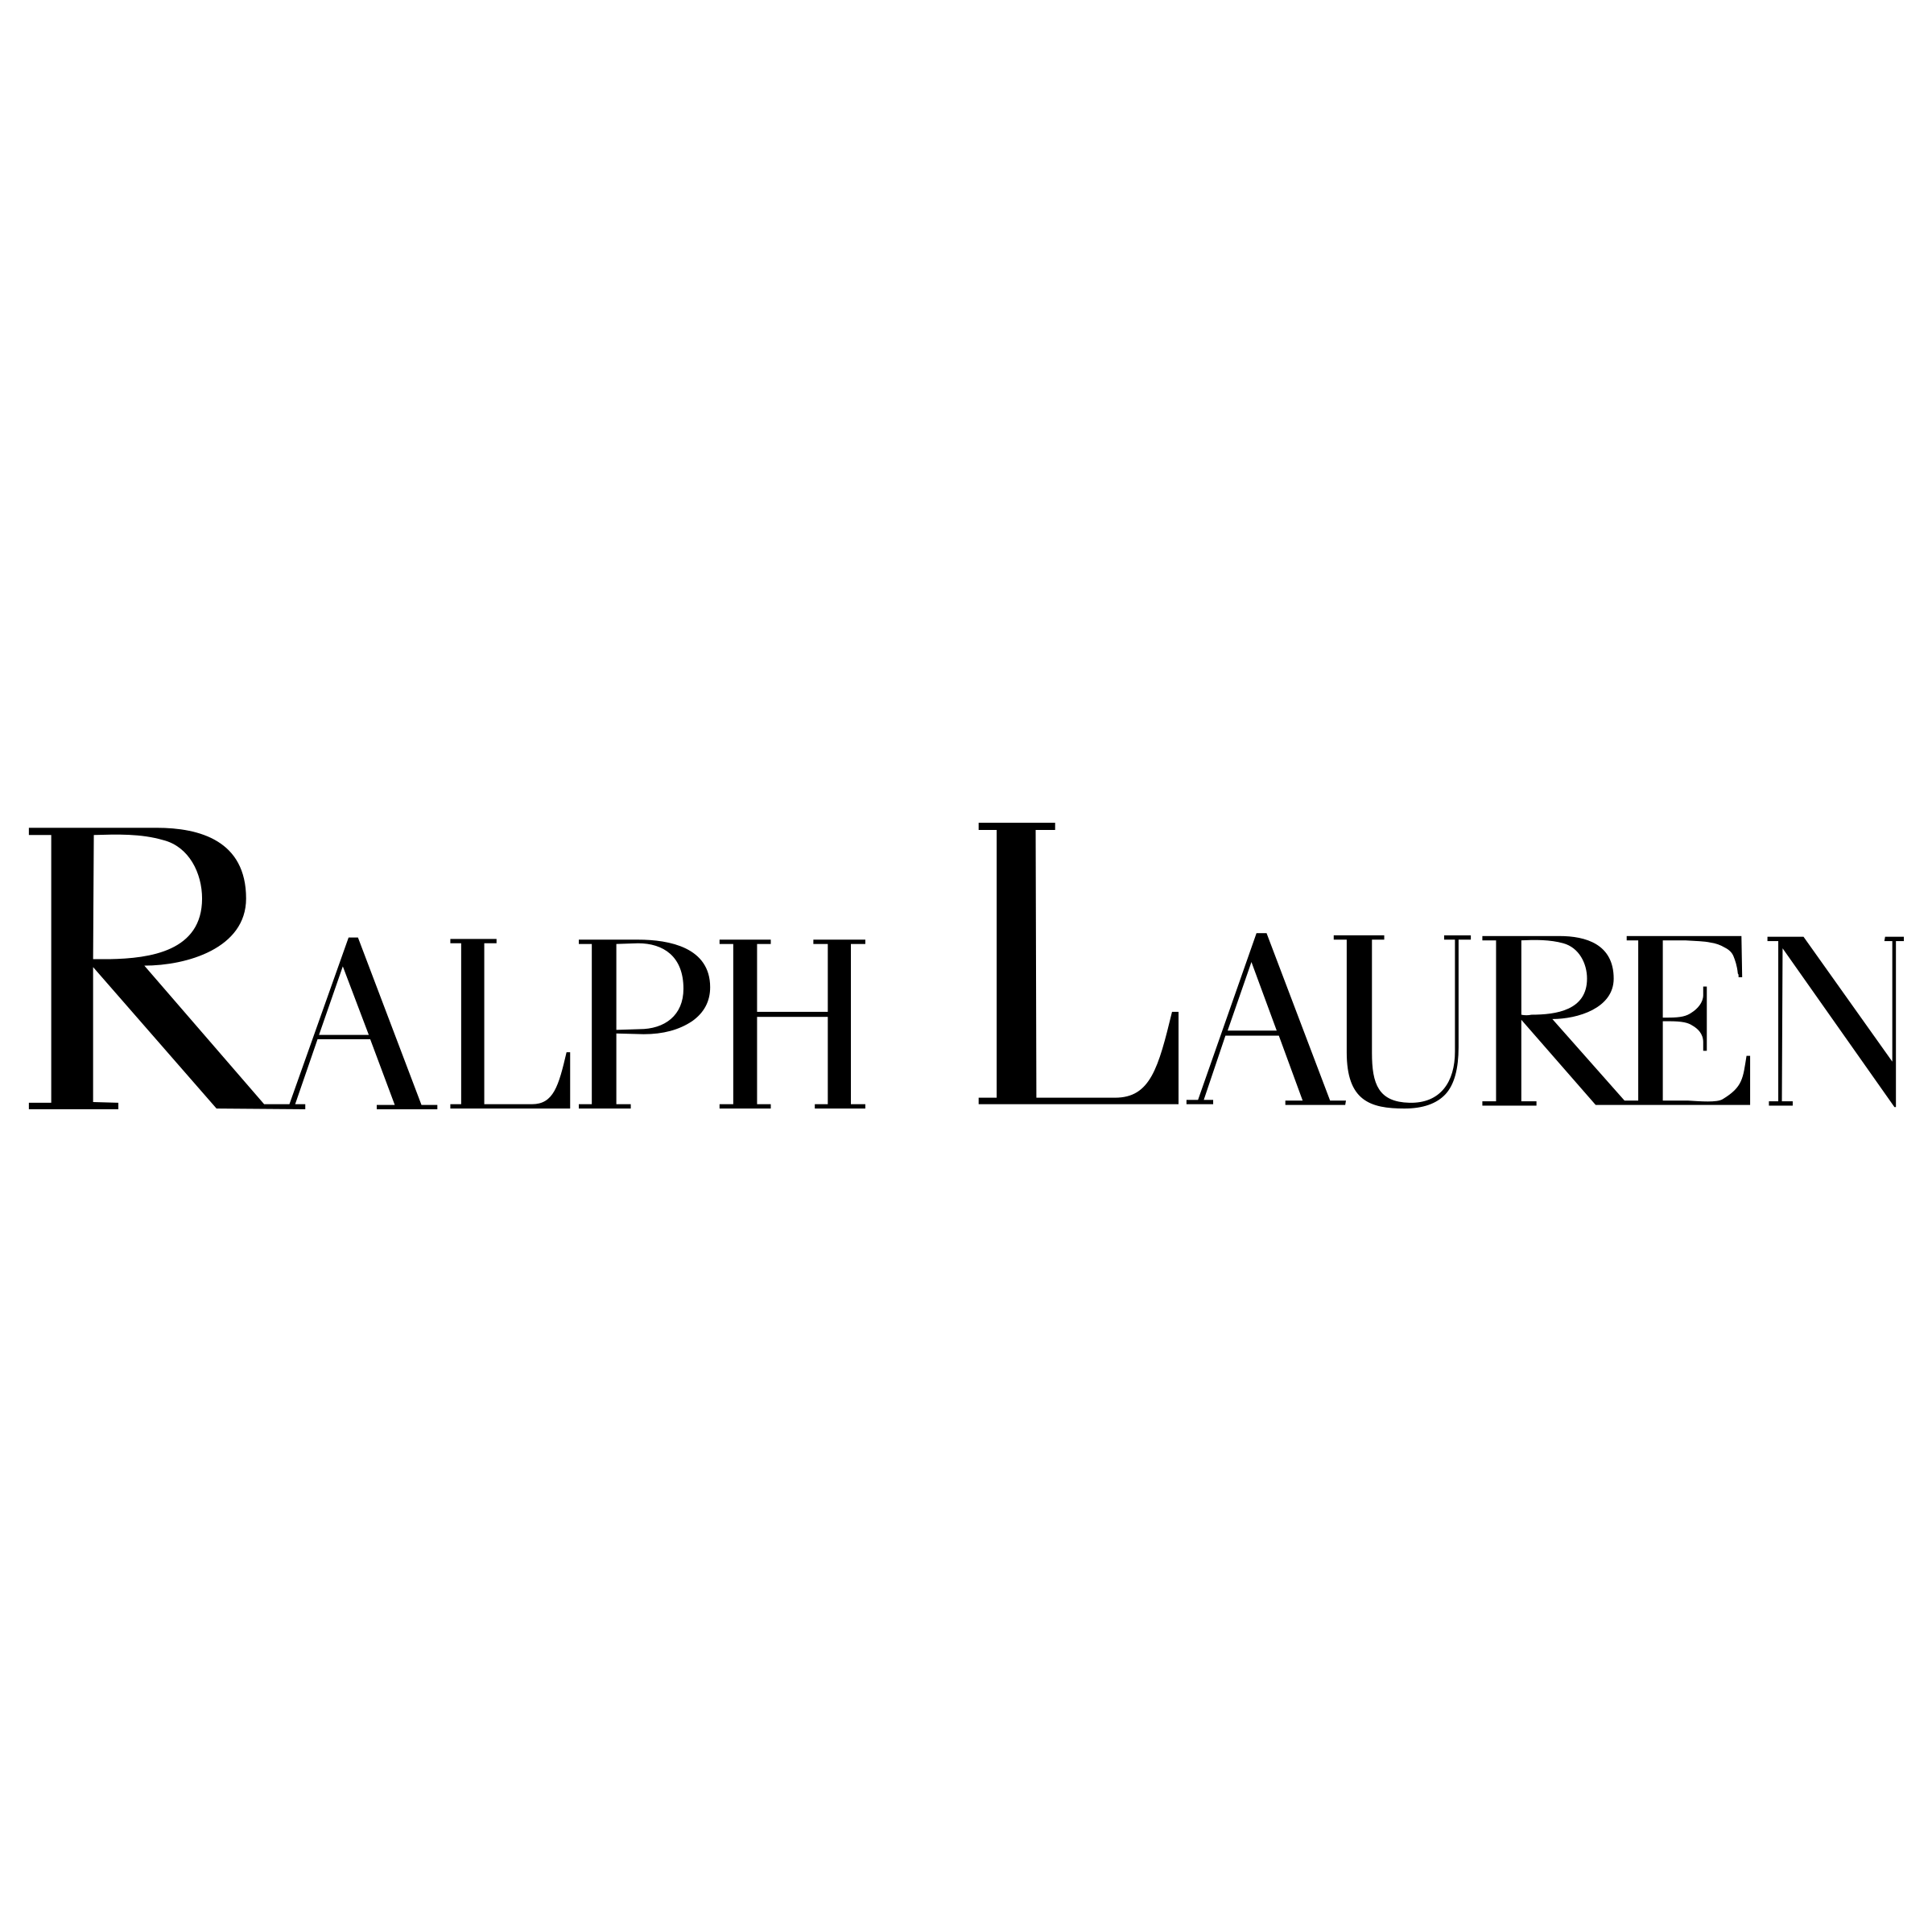 ralph-laurent-logo-png-transparent.png